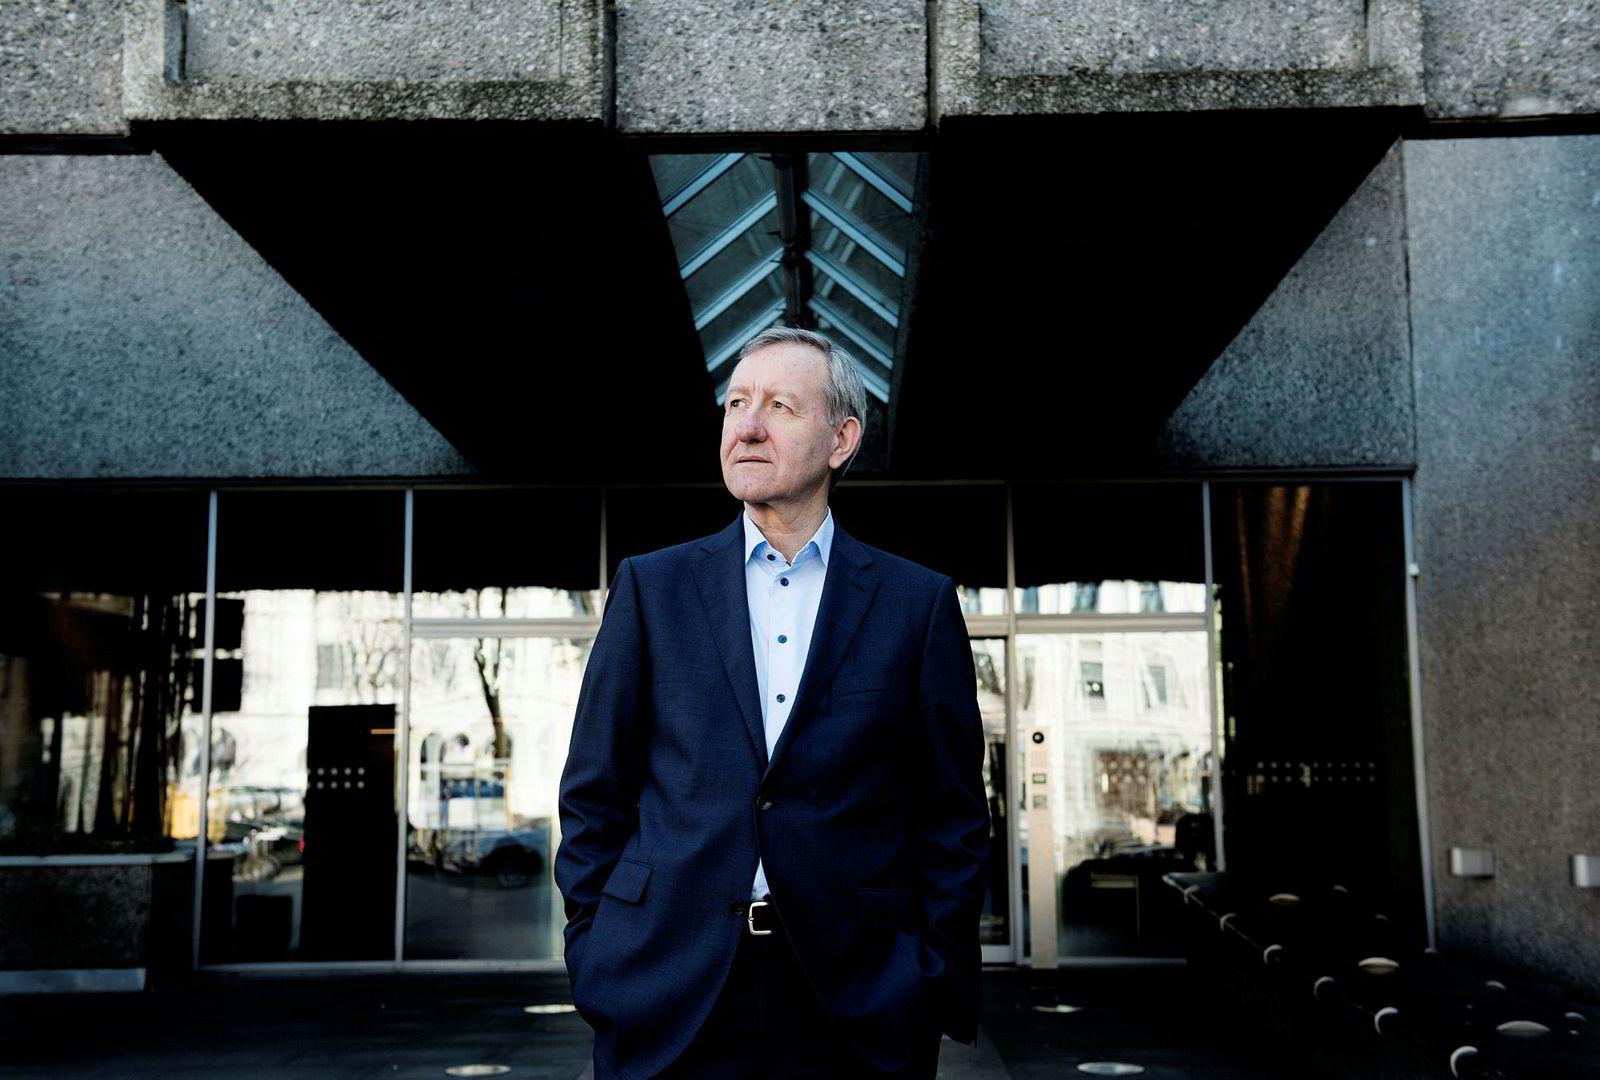 Administrerende direktør Per Hanstad i Den norske Revisorforening er svært fornøyd med at Skattedirektoratet har endret mening om kvitteringsplikt.